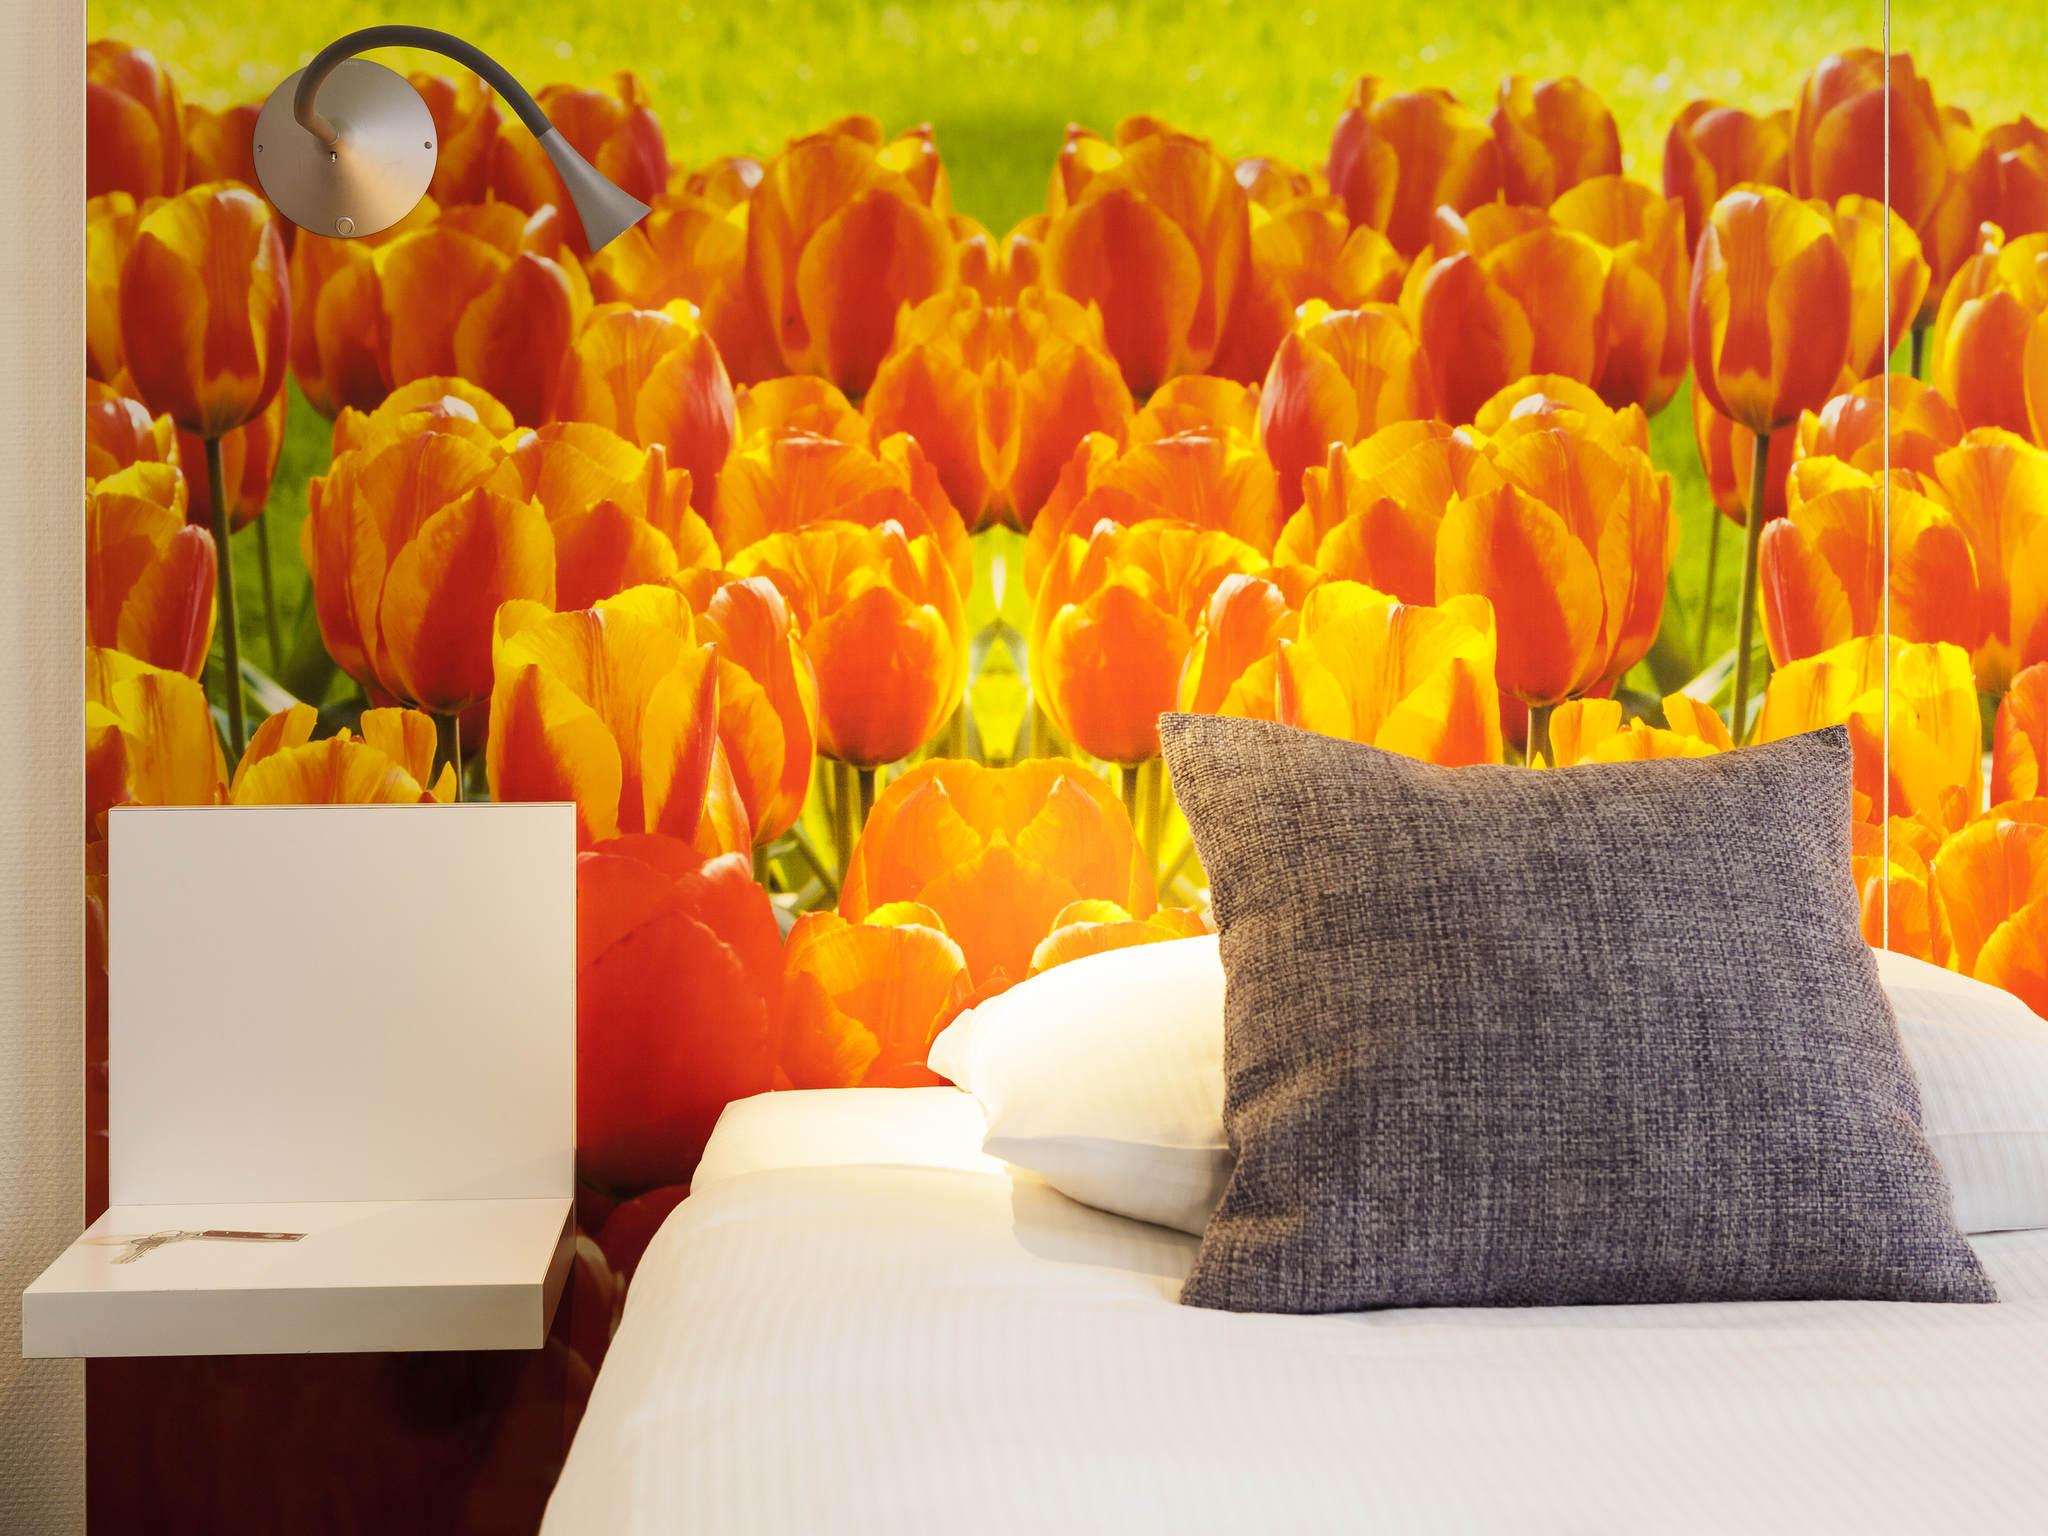 فندق - فندق إيبيس ستايلز ibis Styles أمستردام سيتي